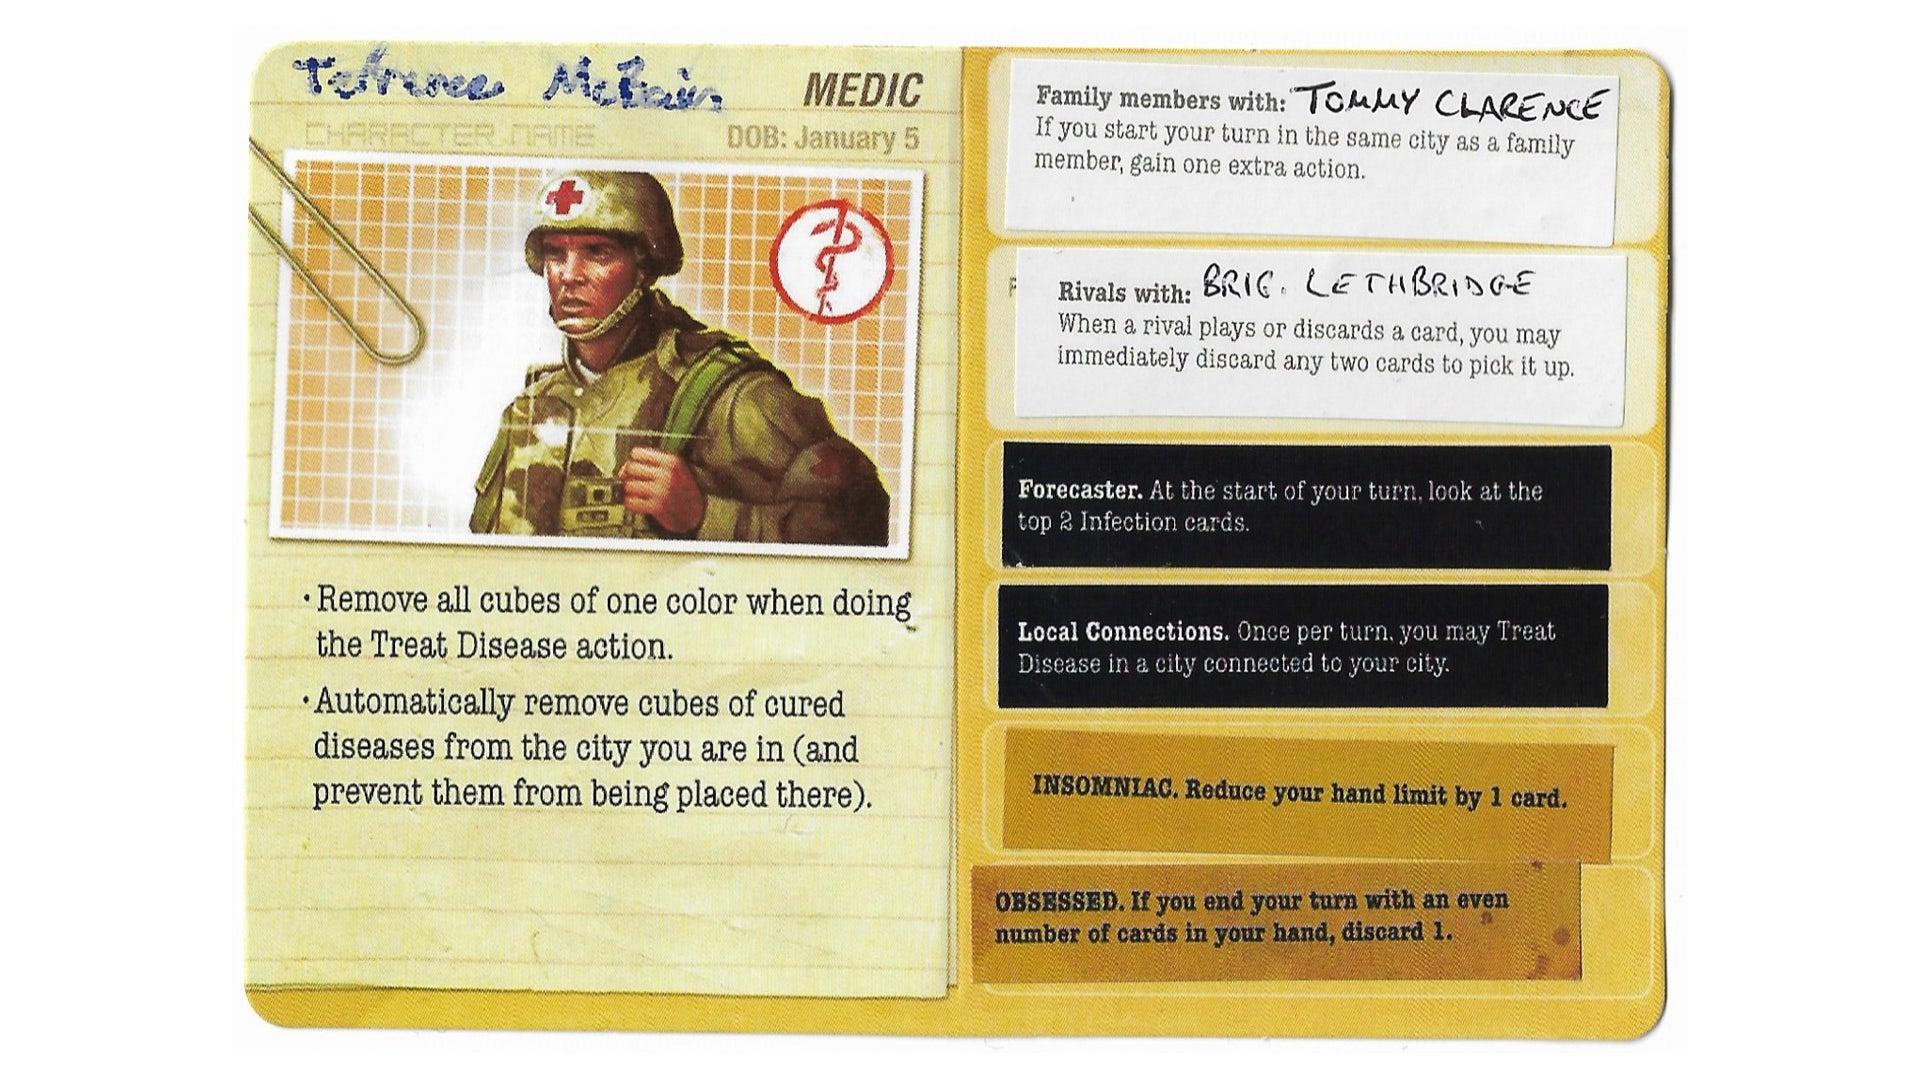 A modified board game